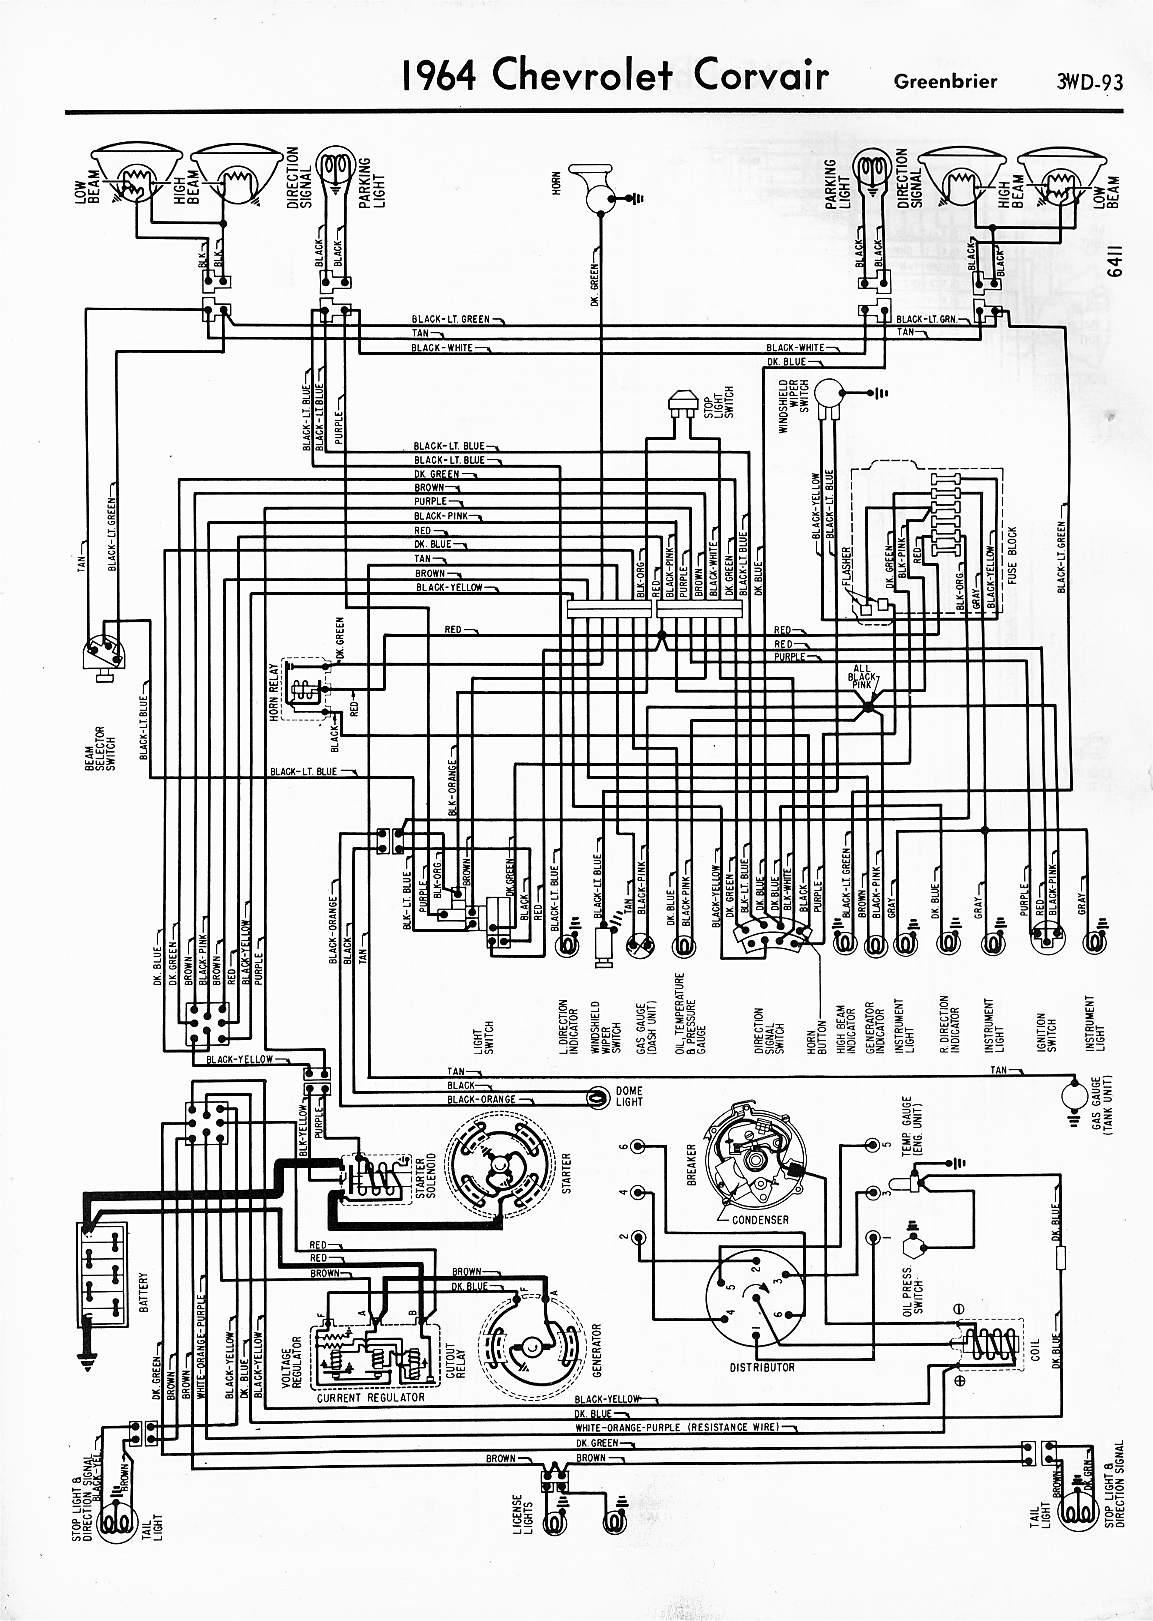 Tactical Shtf International 674 Tractor Generac Generator Wiring Layout Farmall 560 Diagram Free Download Diagrams Mwirechev64 3wd 093 Diagramhtml